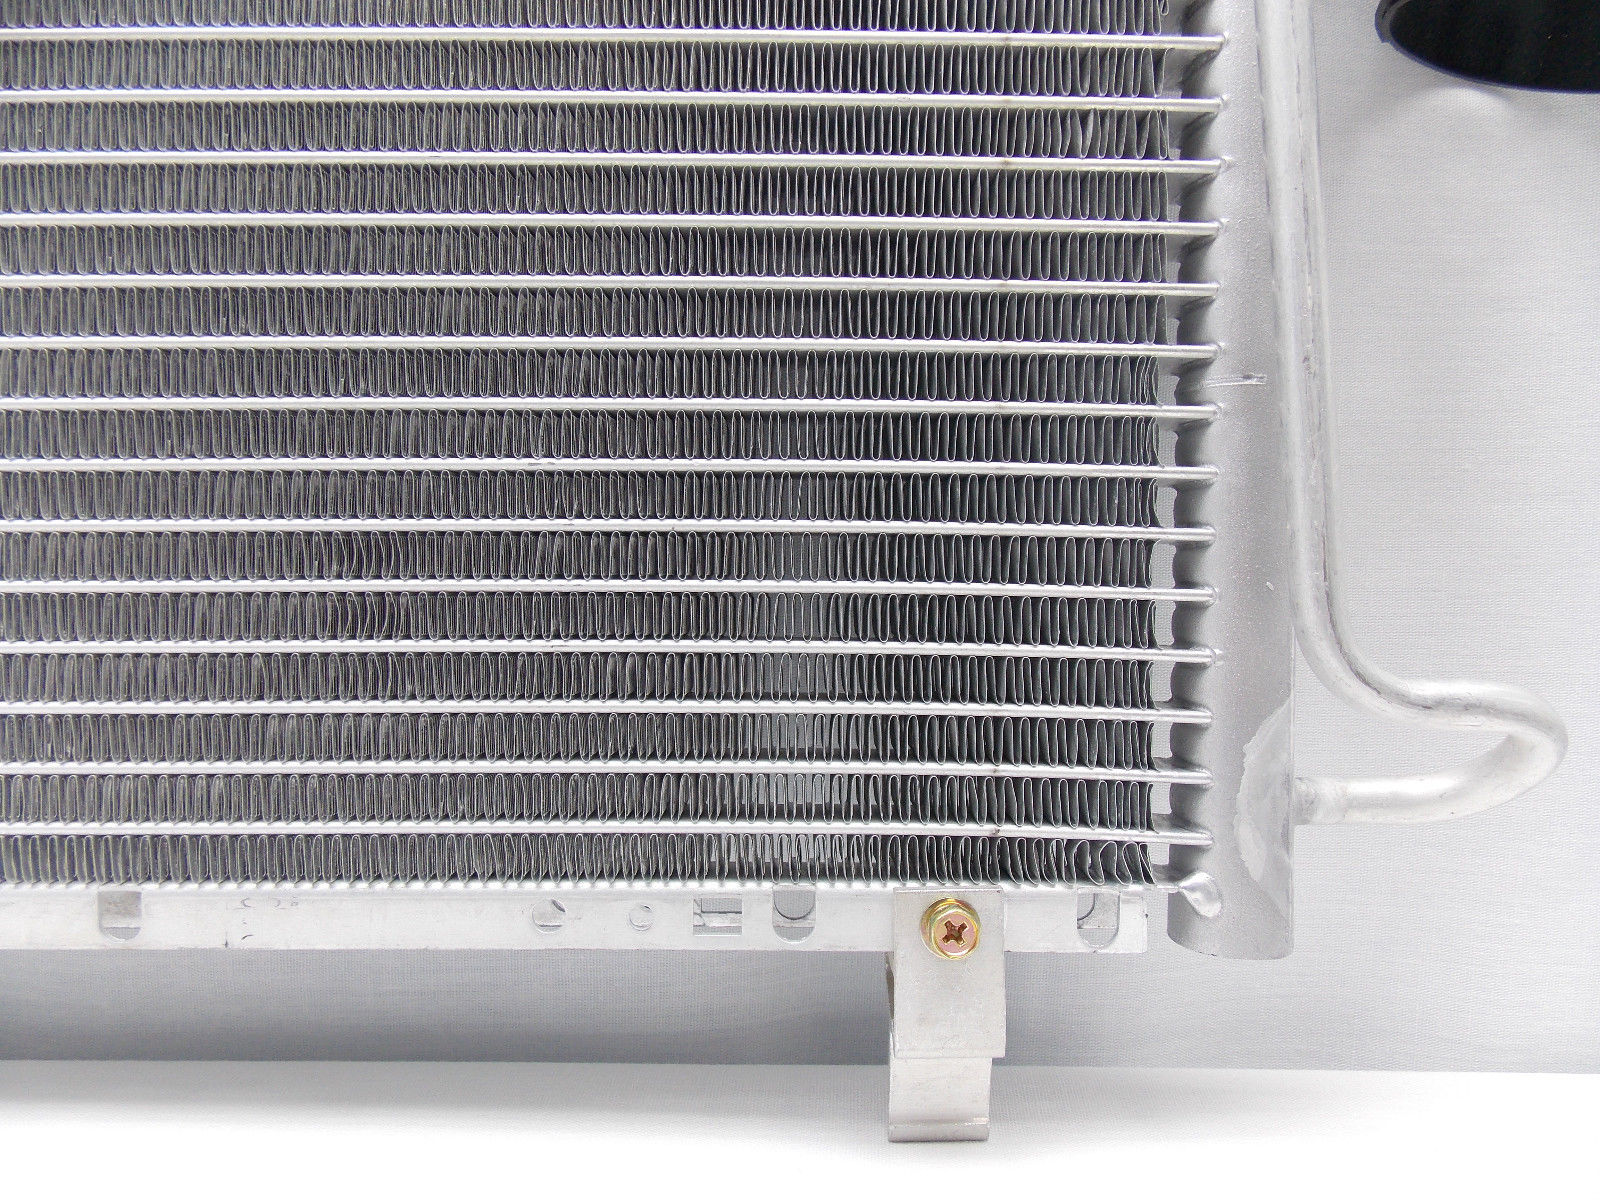 Sunbelt A//C AC Condenser For Isuzu Rodeo Honda Passport 3005 Drop in Fitment